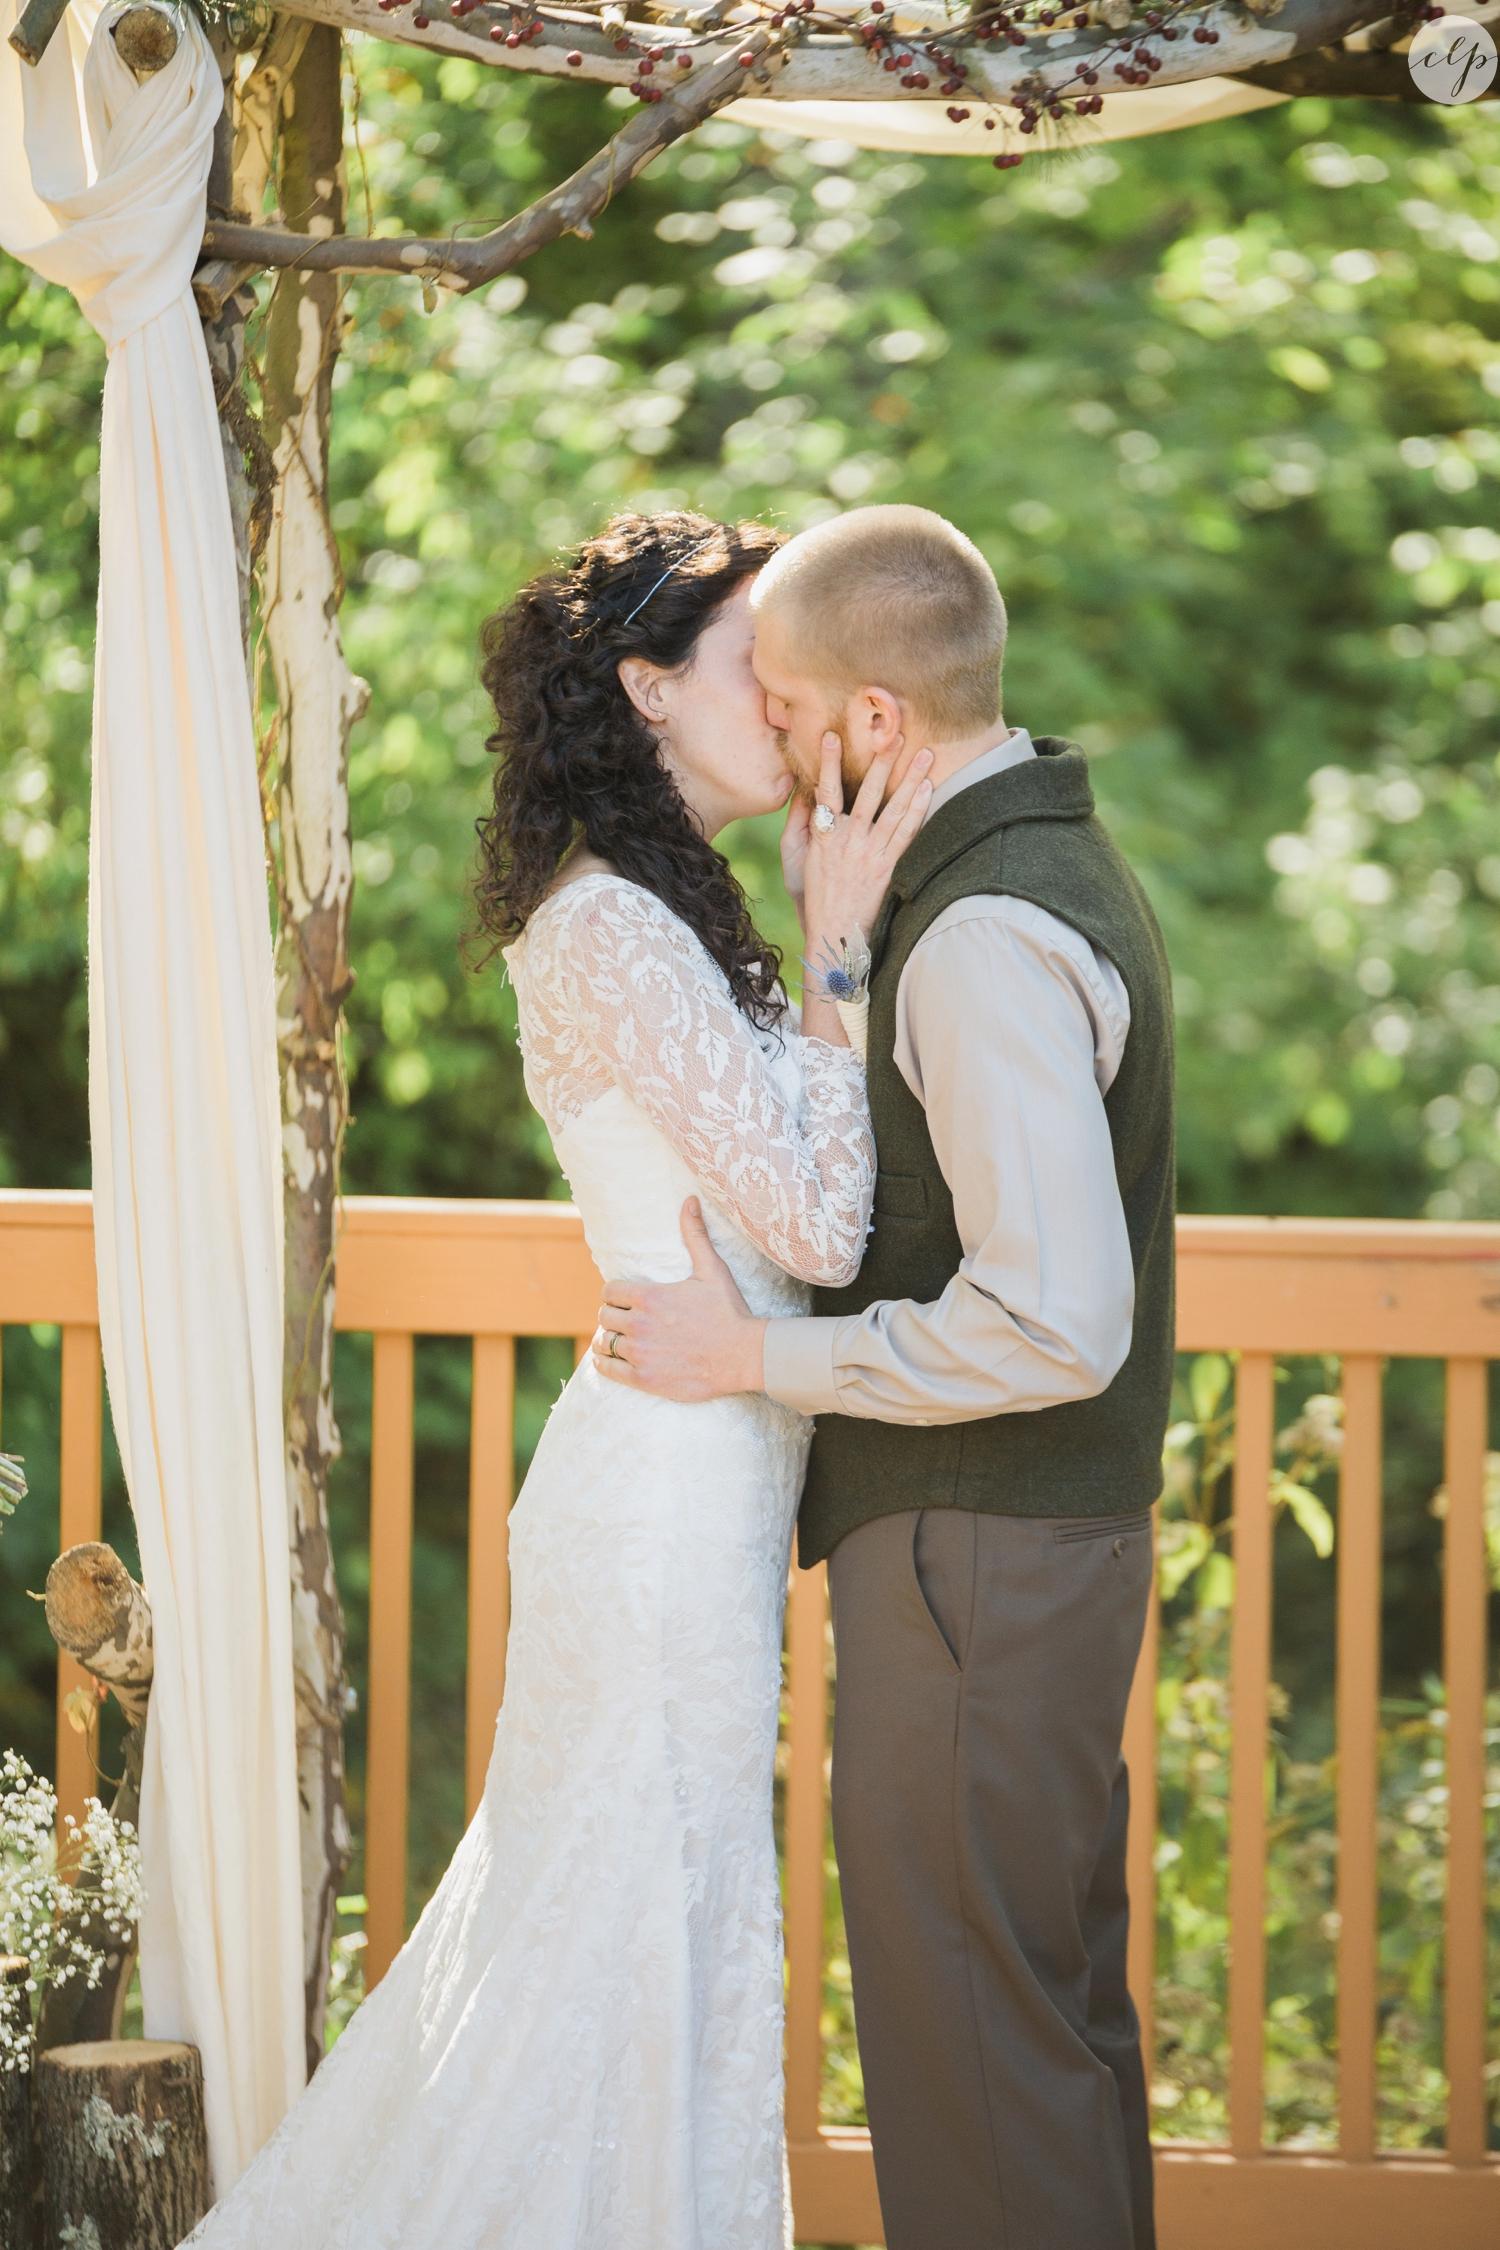 Outdoor-Wedding-in-the-Woods-Photography_4256.jpg